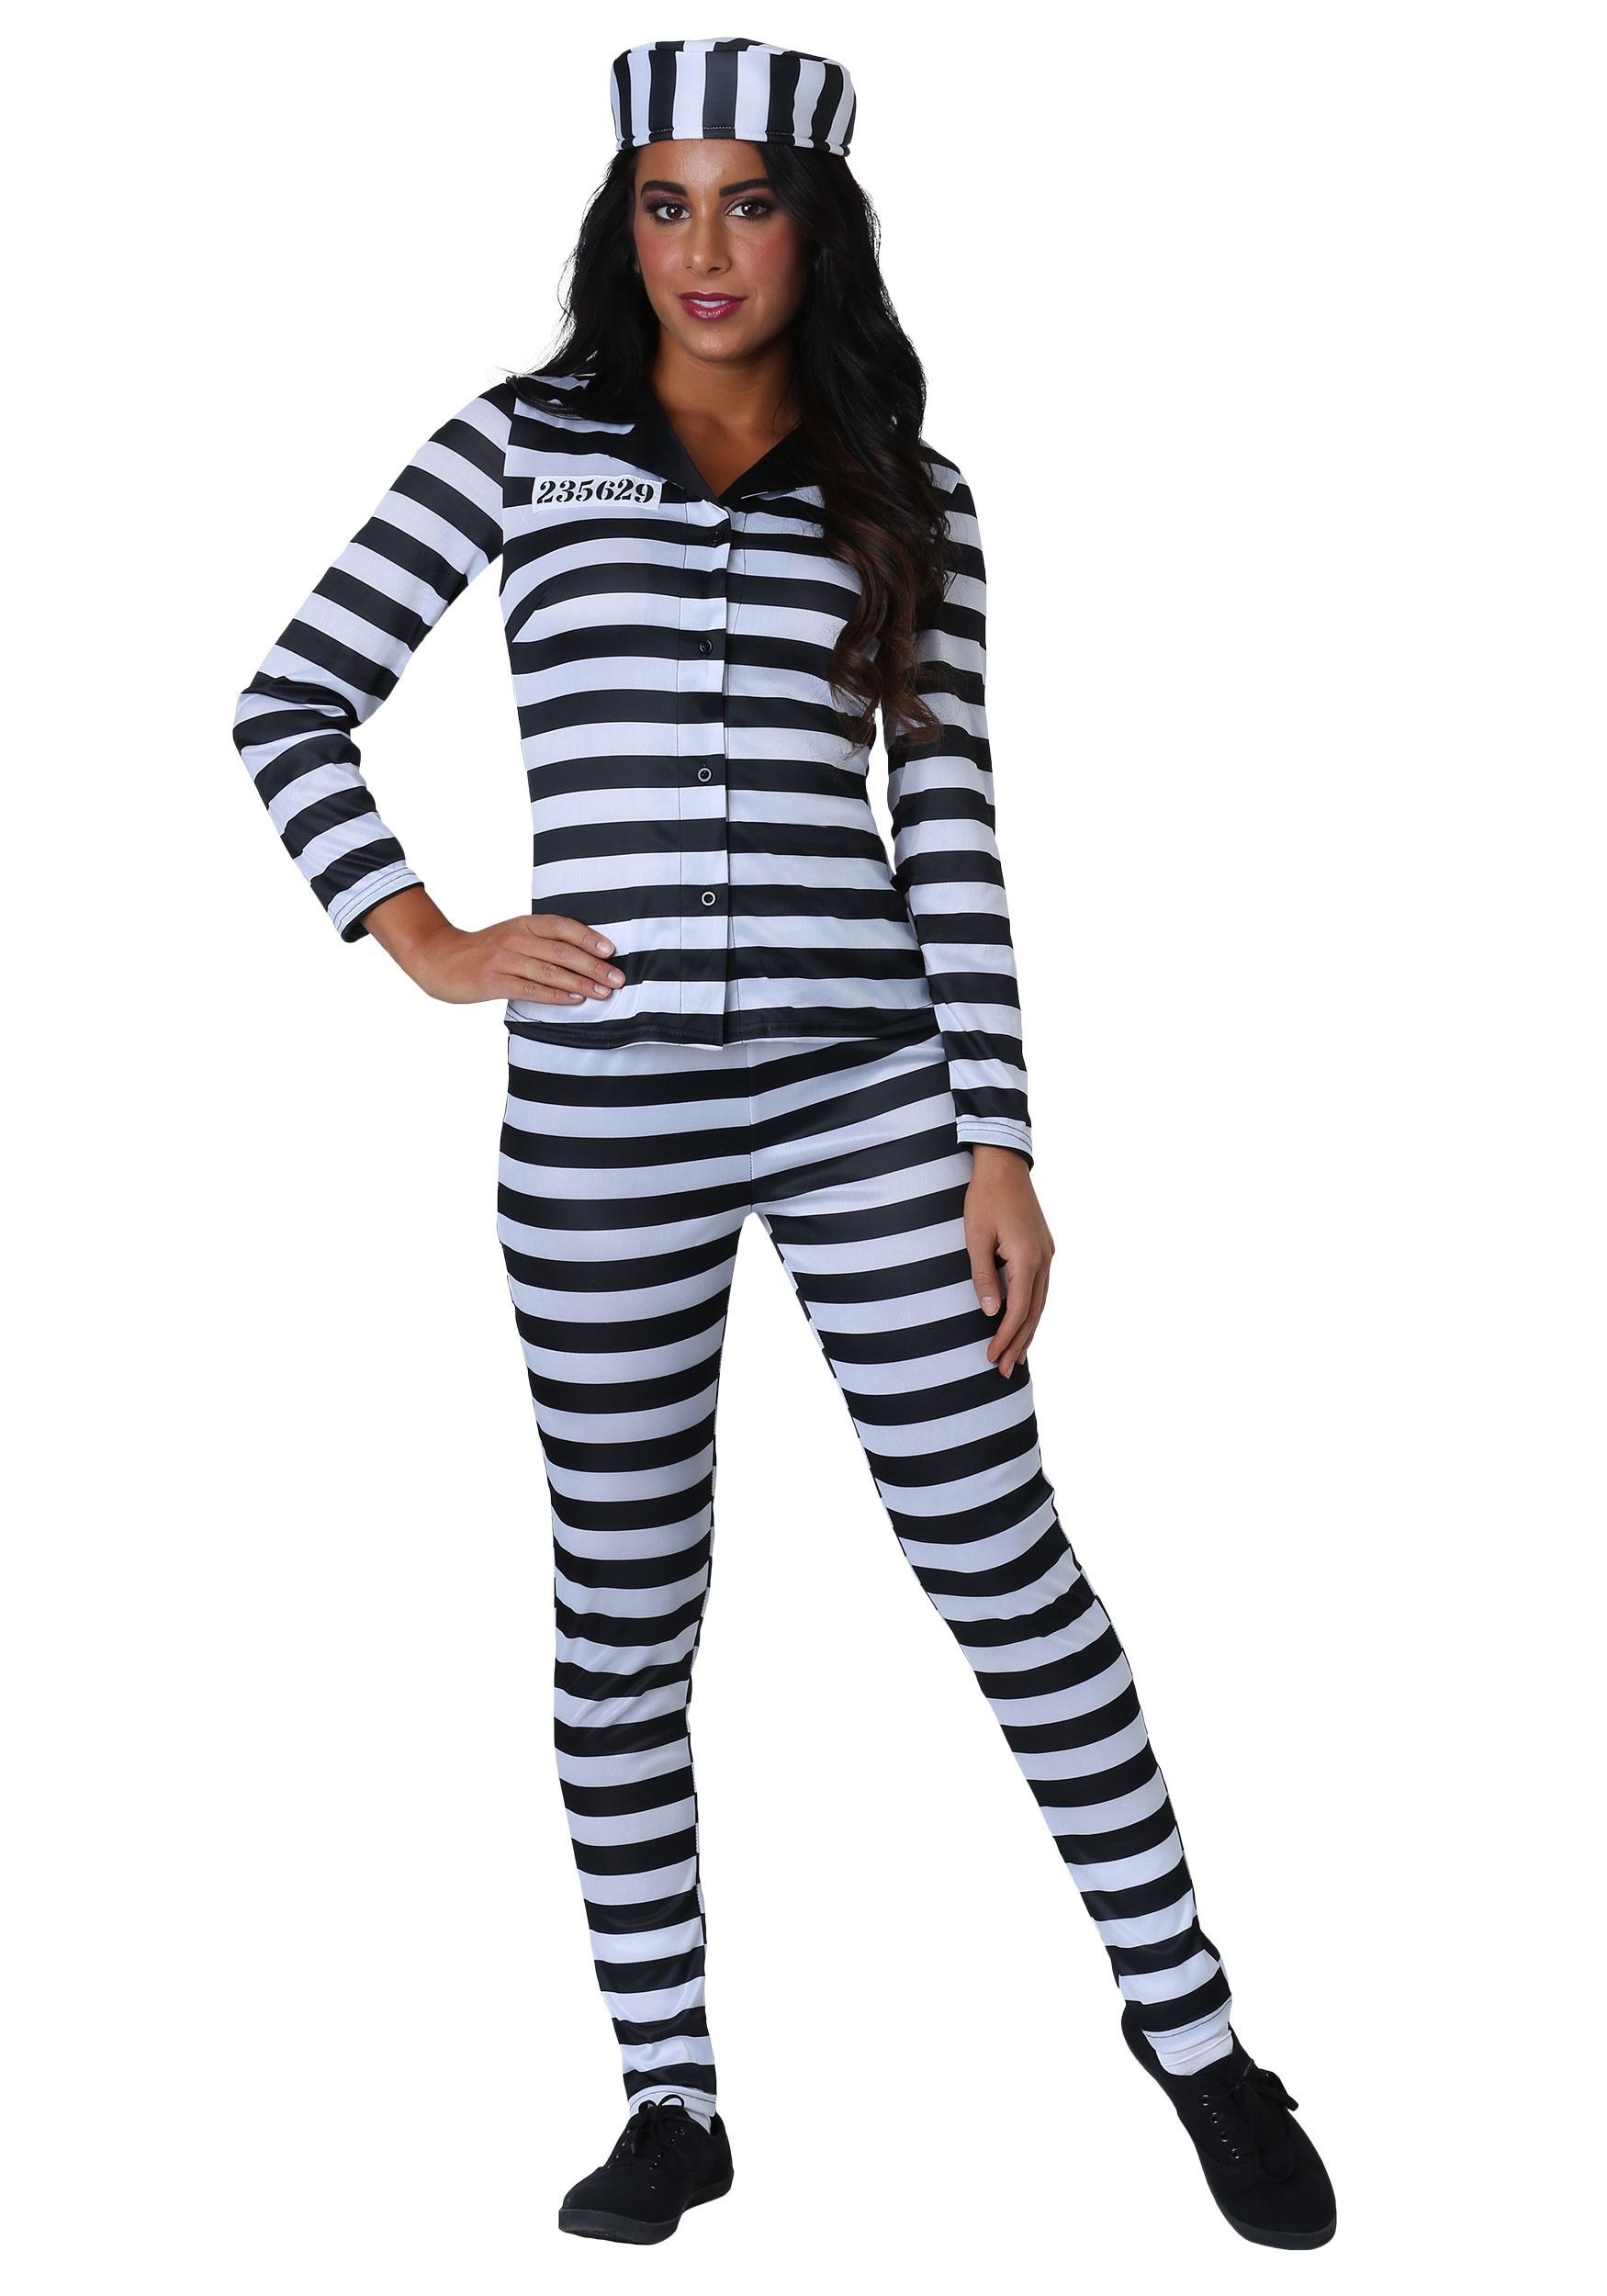 Incarcerated Cutie Costume for Women